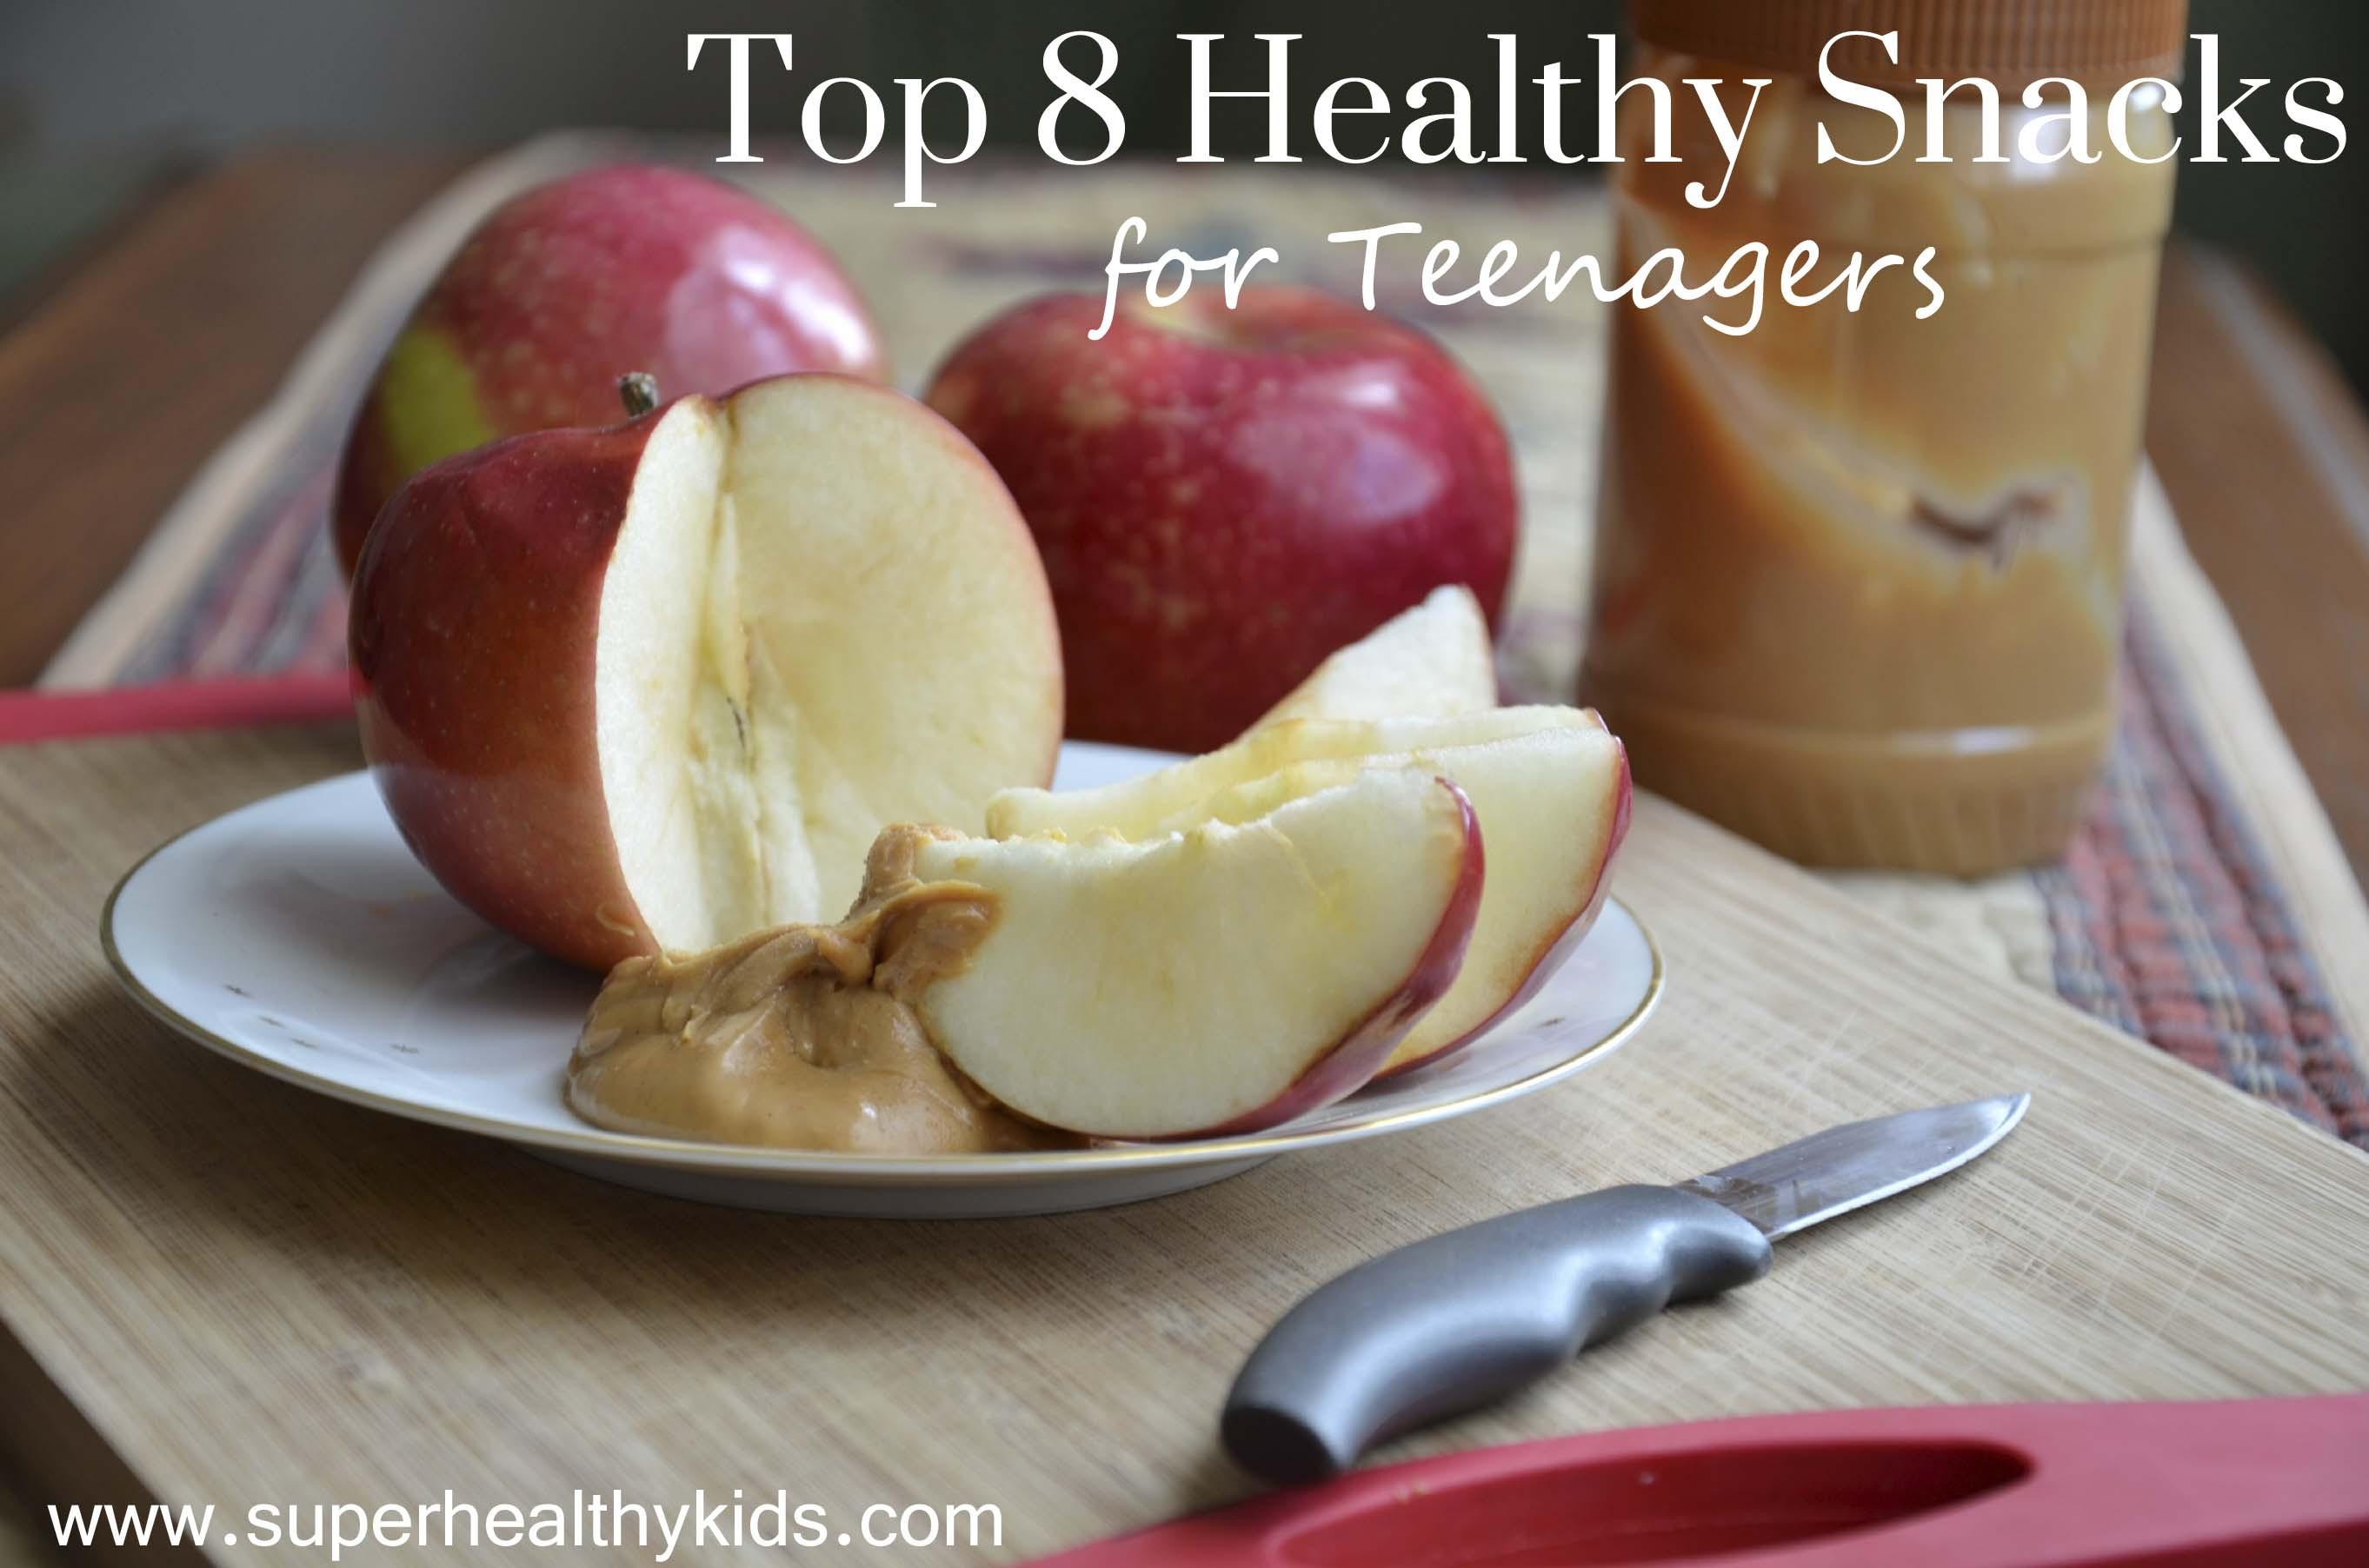 Healthy Snacks For Teens  Top 8 Healthy Snacks for Teenagers